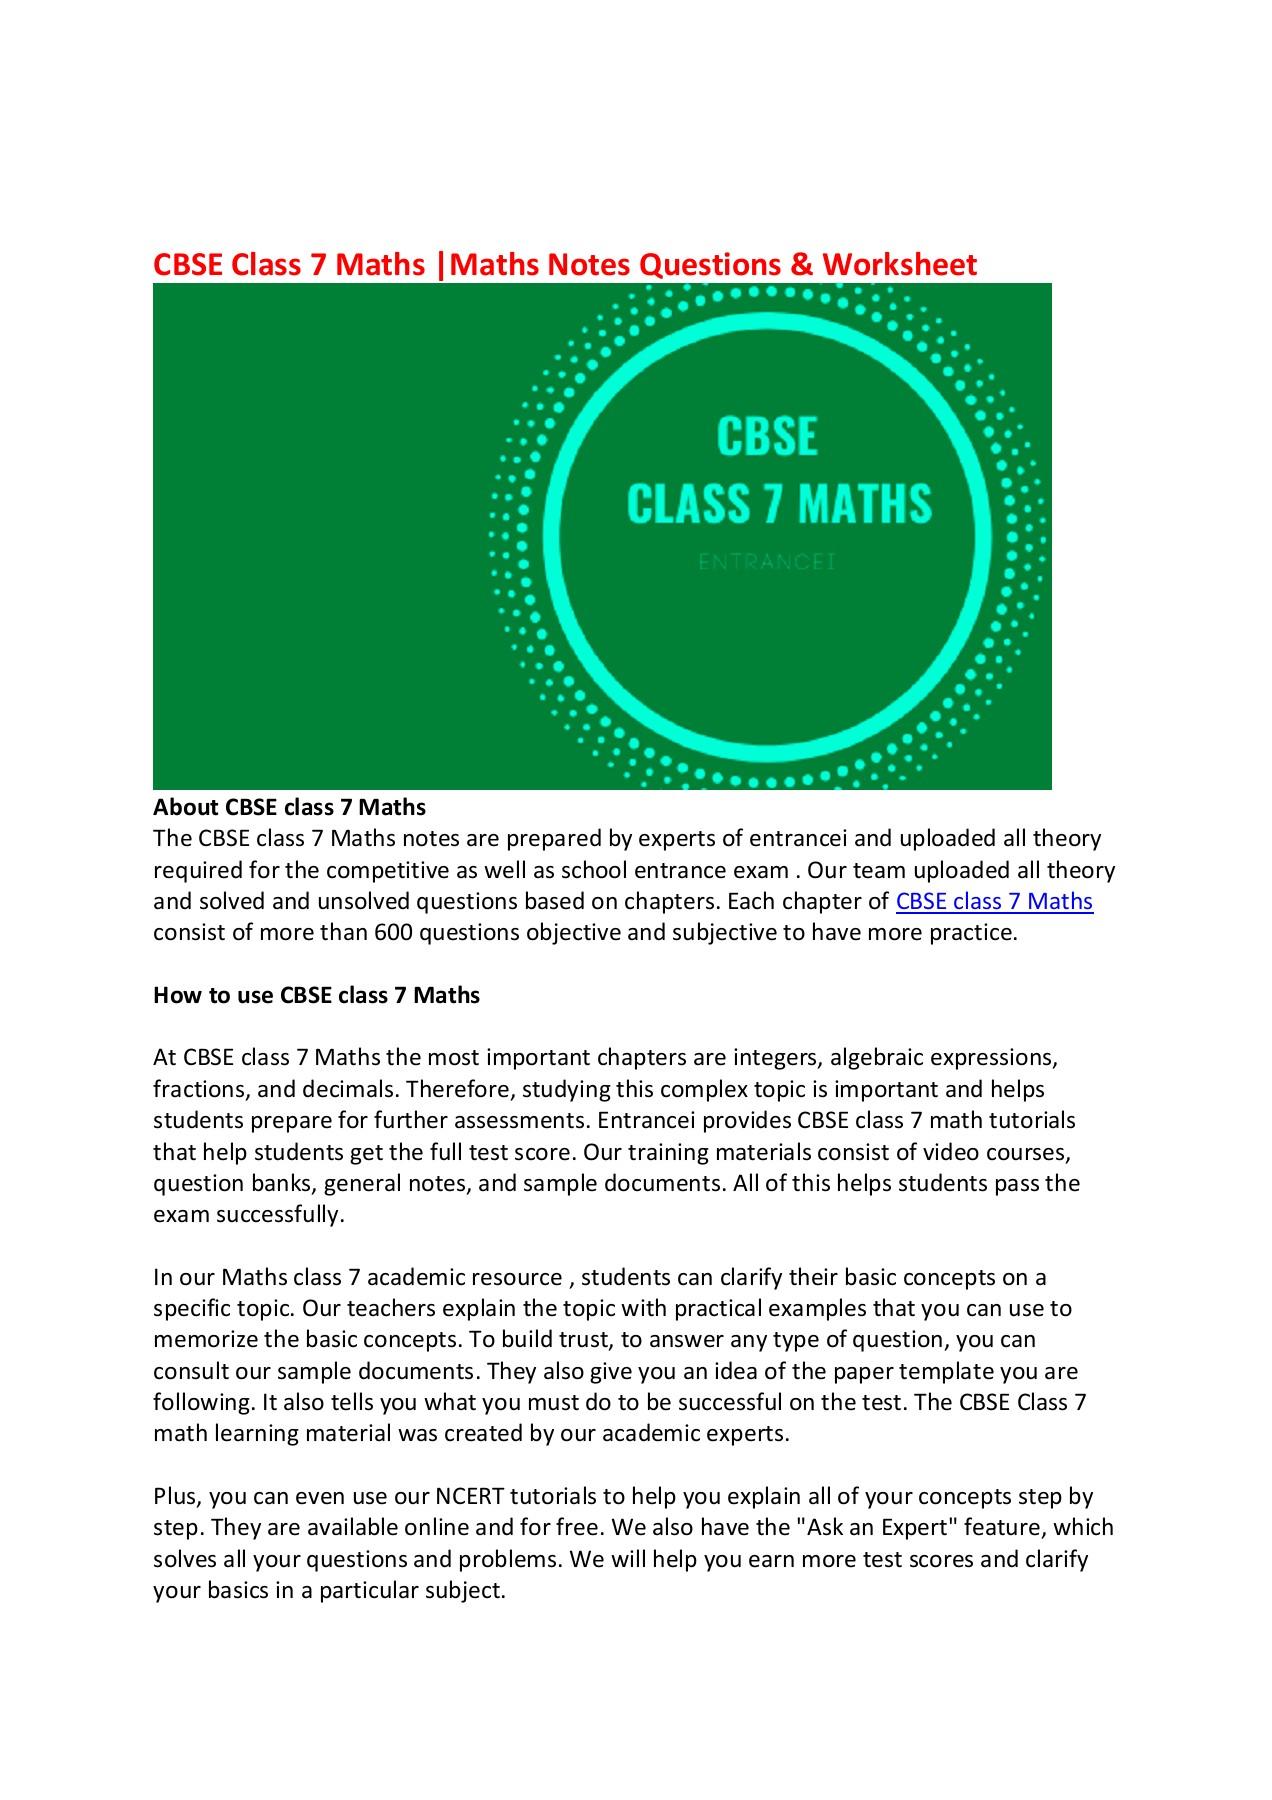 medium resolution of CBSE class 7 Maths Pages 1 - 2 - Flip PDF Download   FlipHTML5